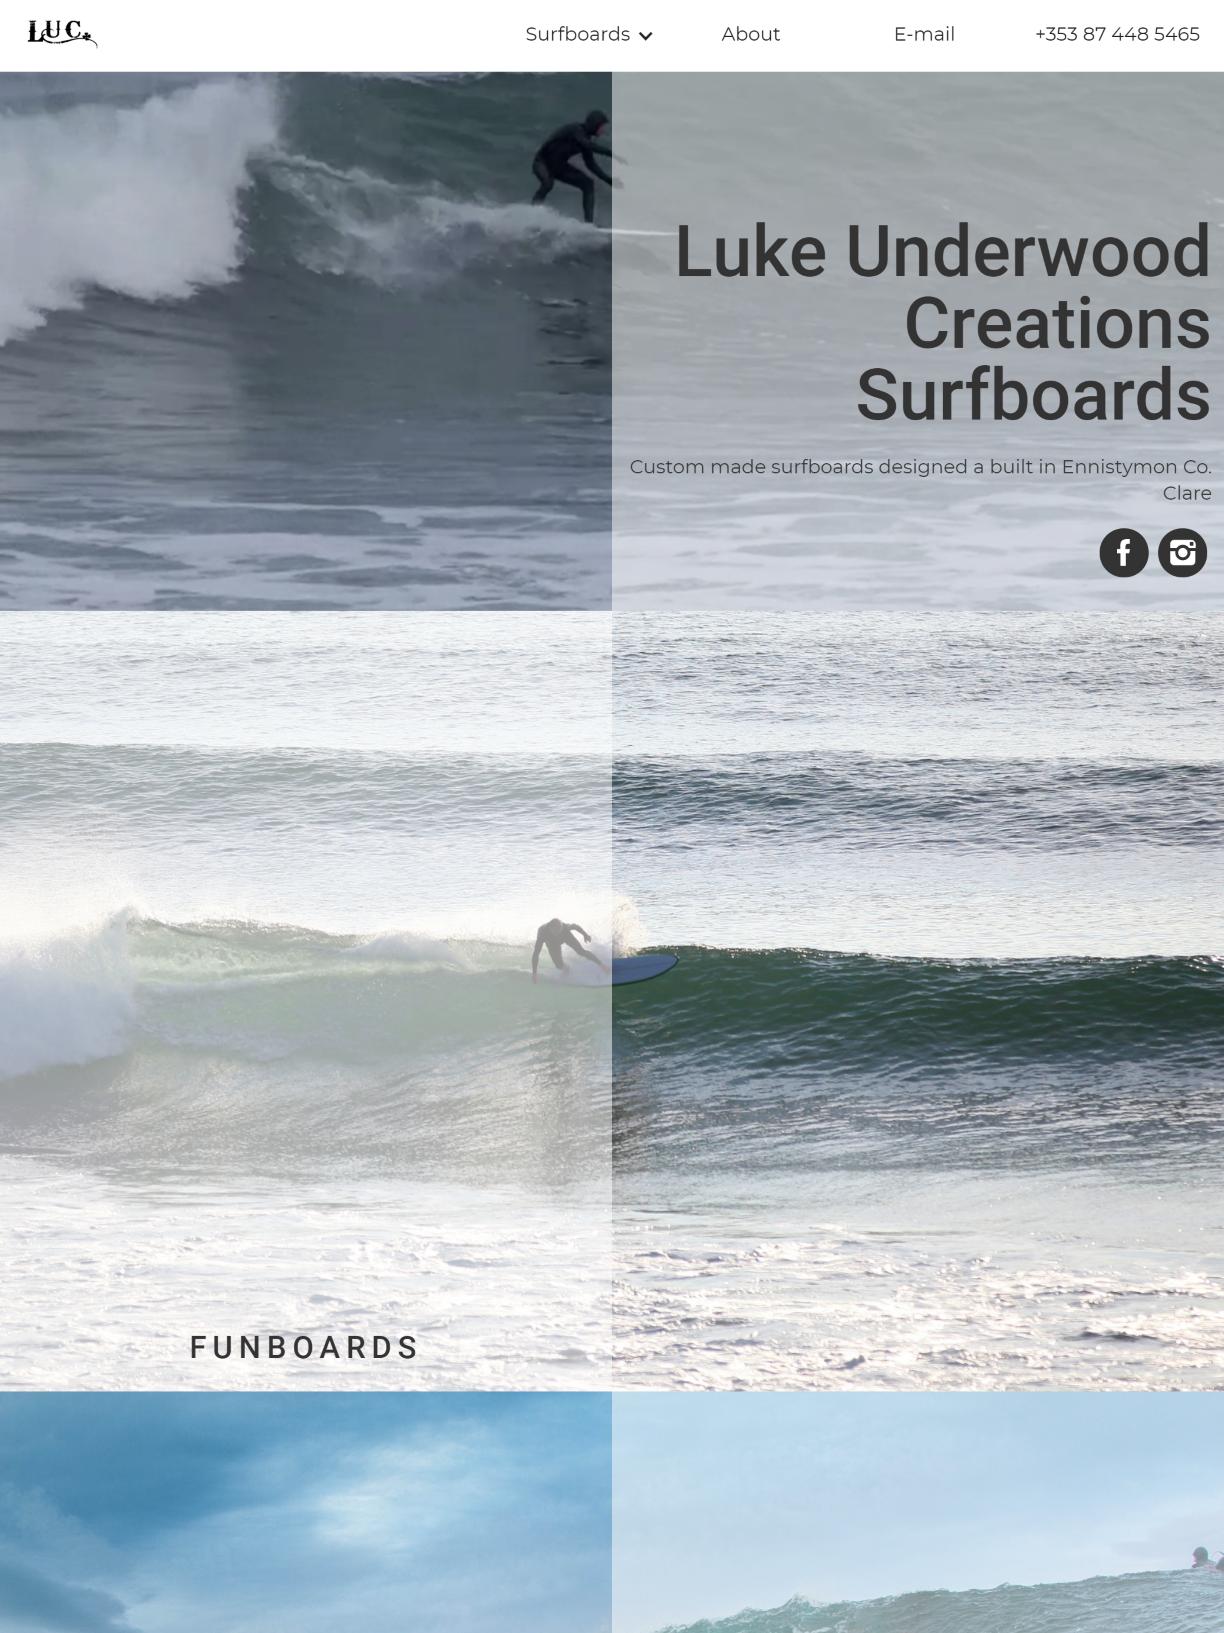 Luke Underwood Creations